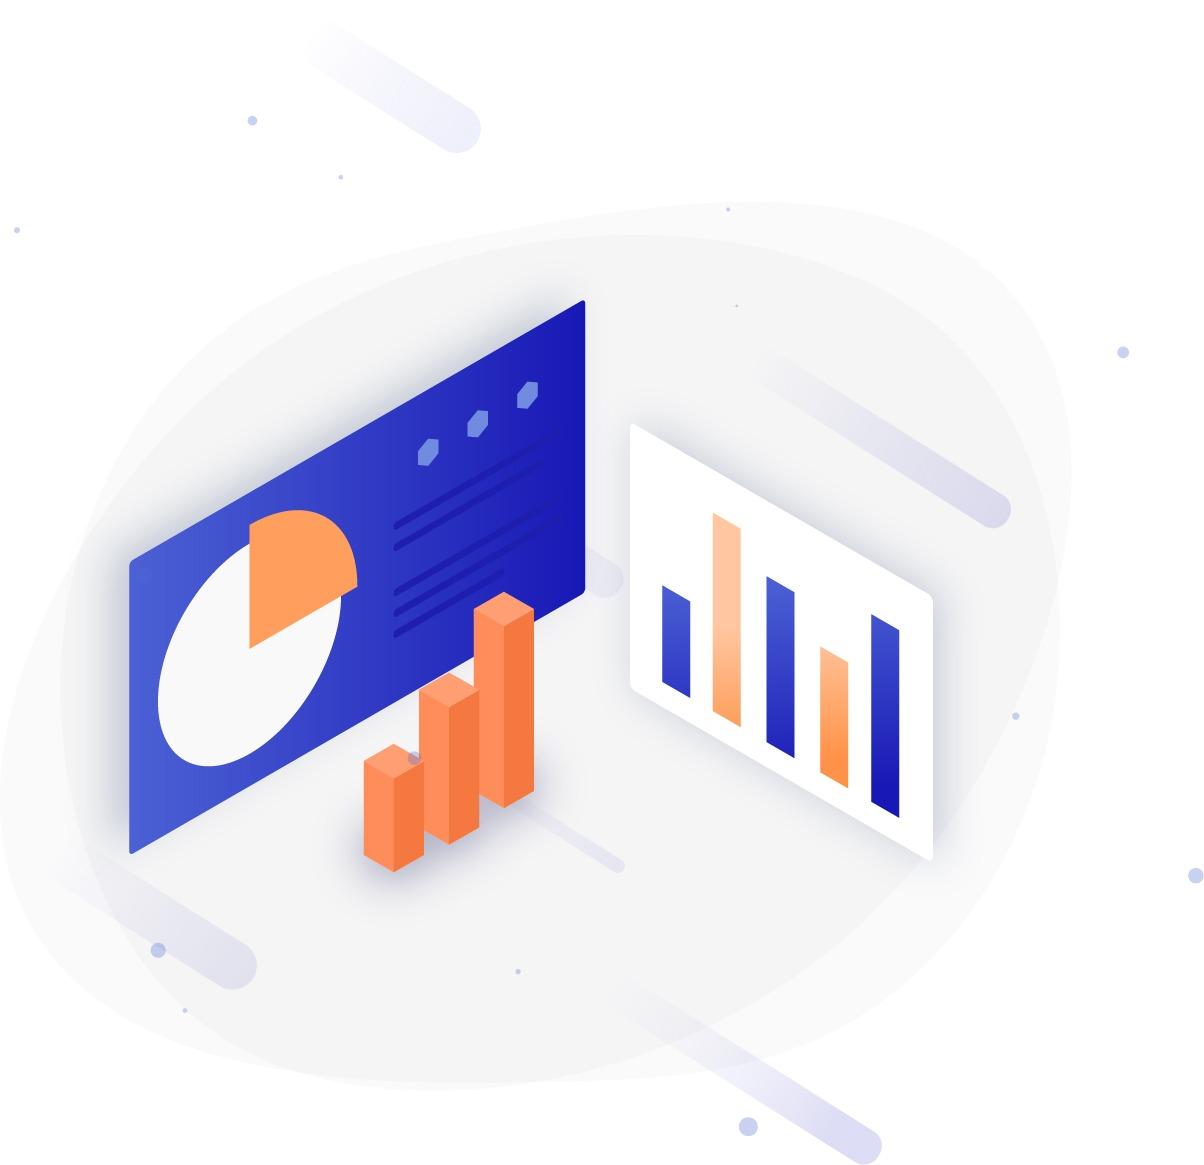 statistique recrutement